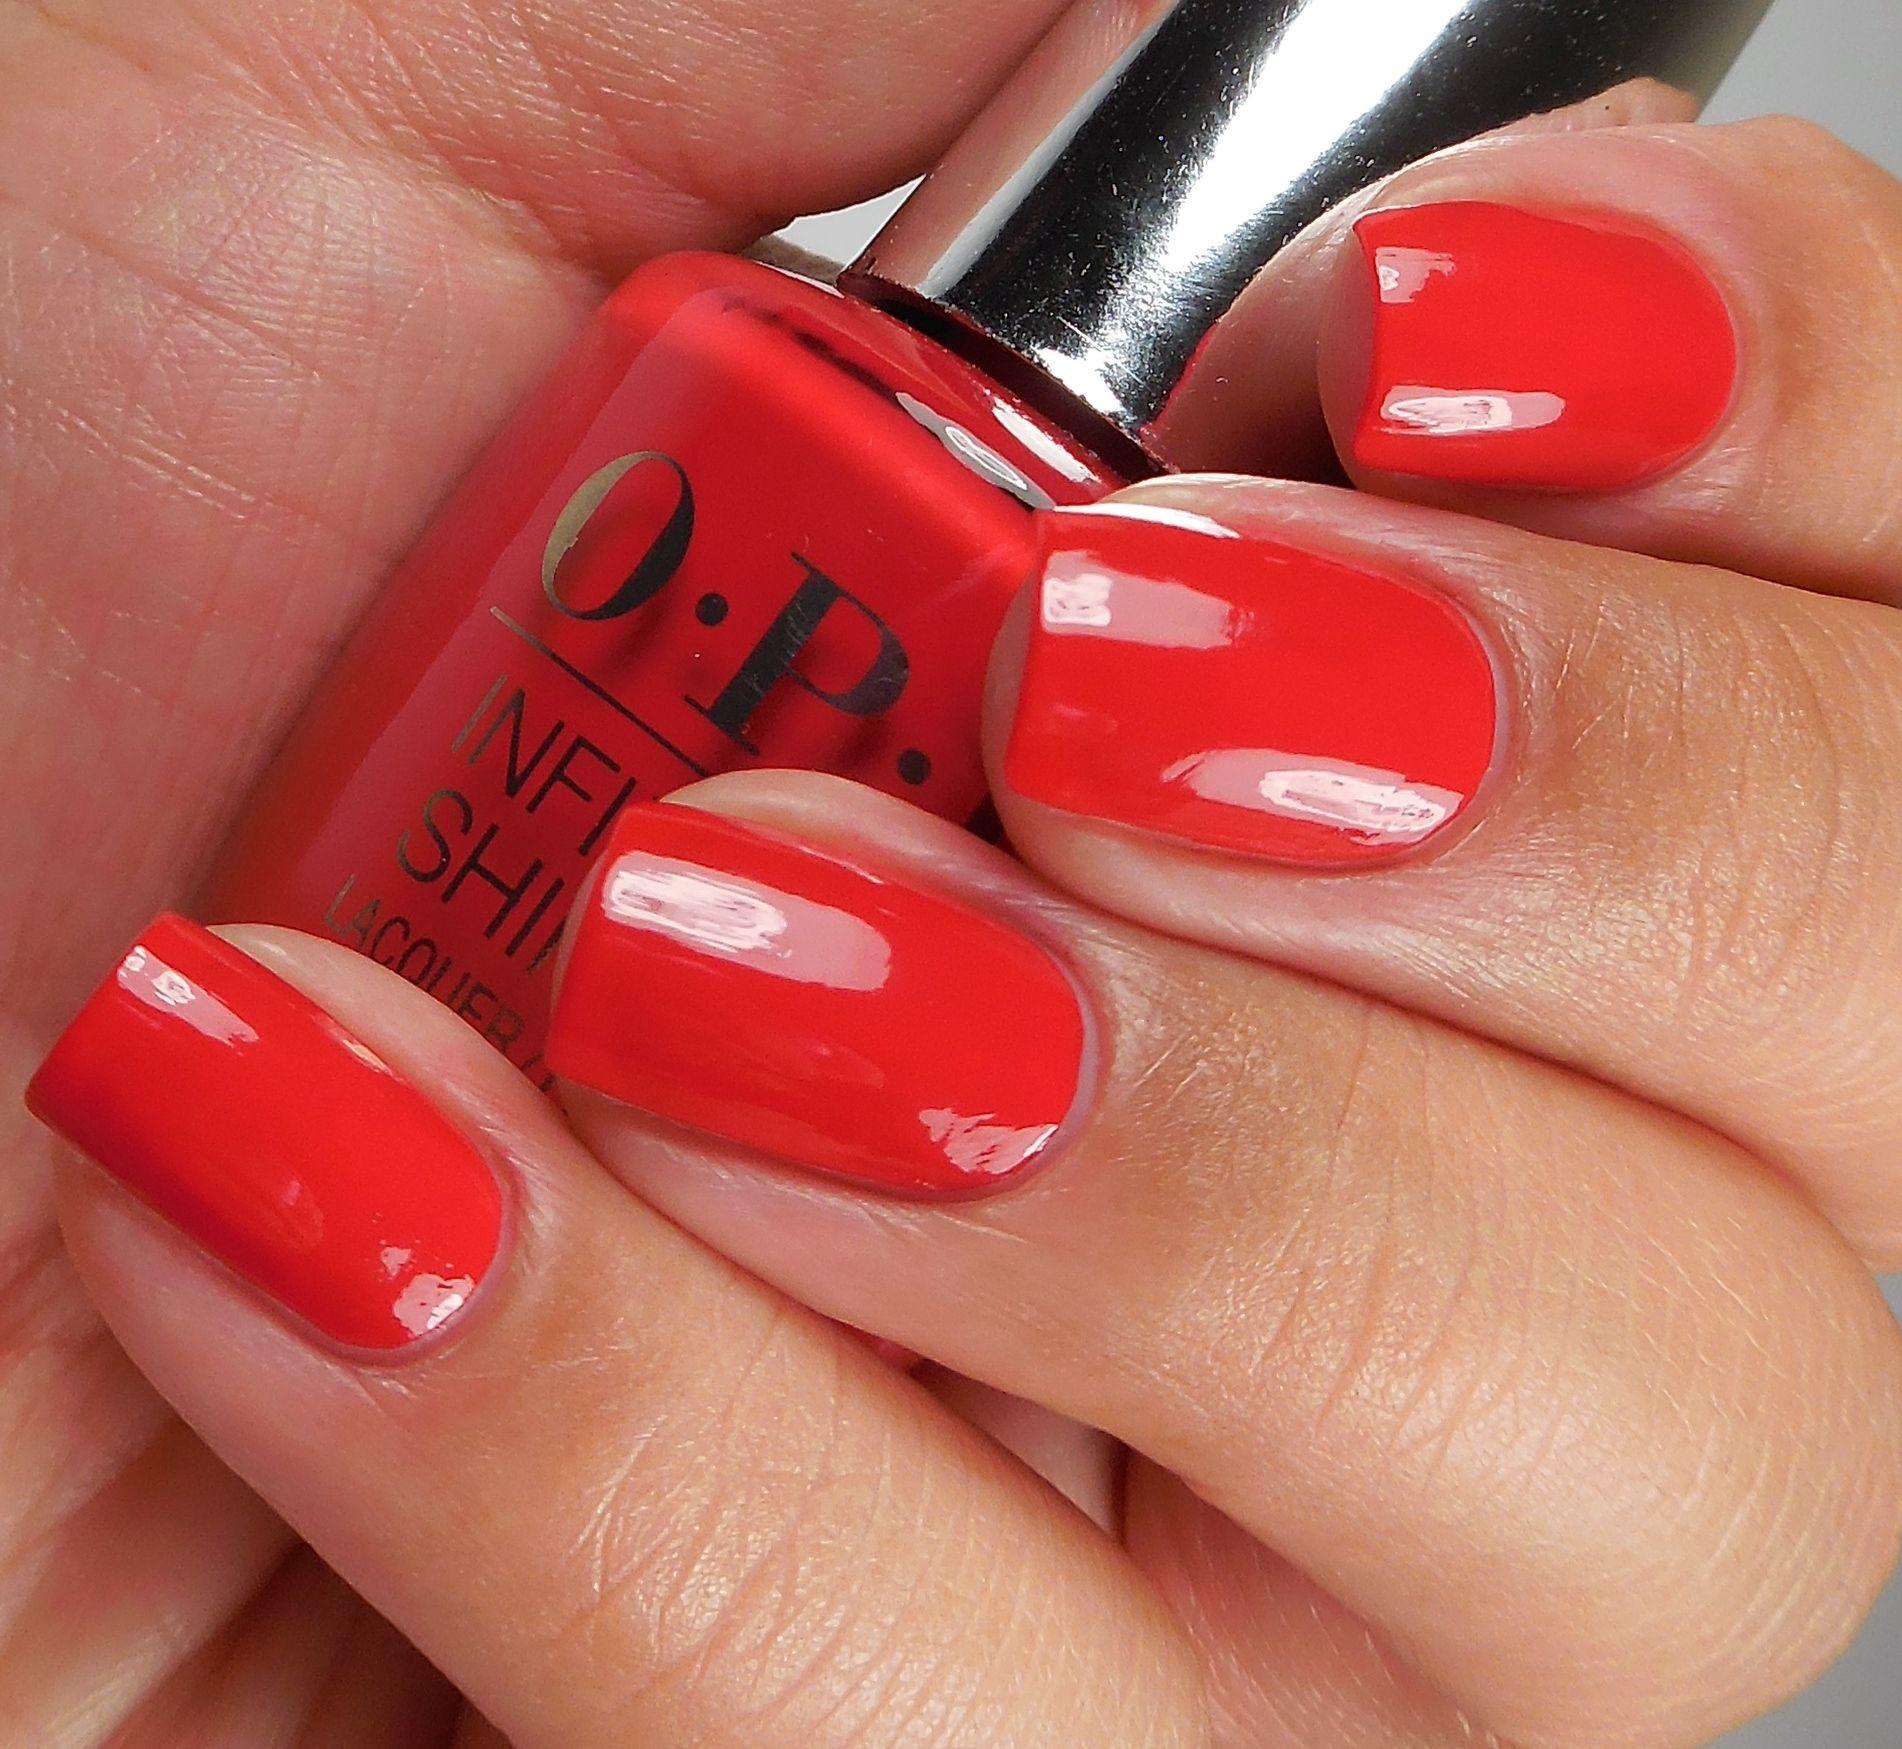 OPI Infinite Shine: ☆ Unequivocally Crimson ☆ ... a long-wearing red creme nail polish